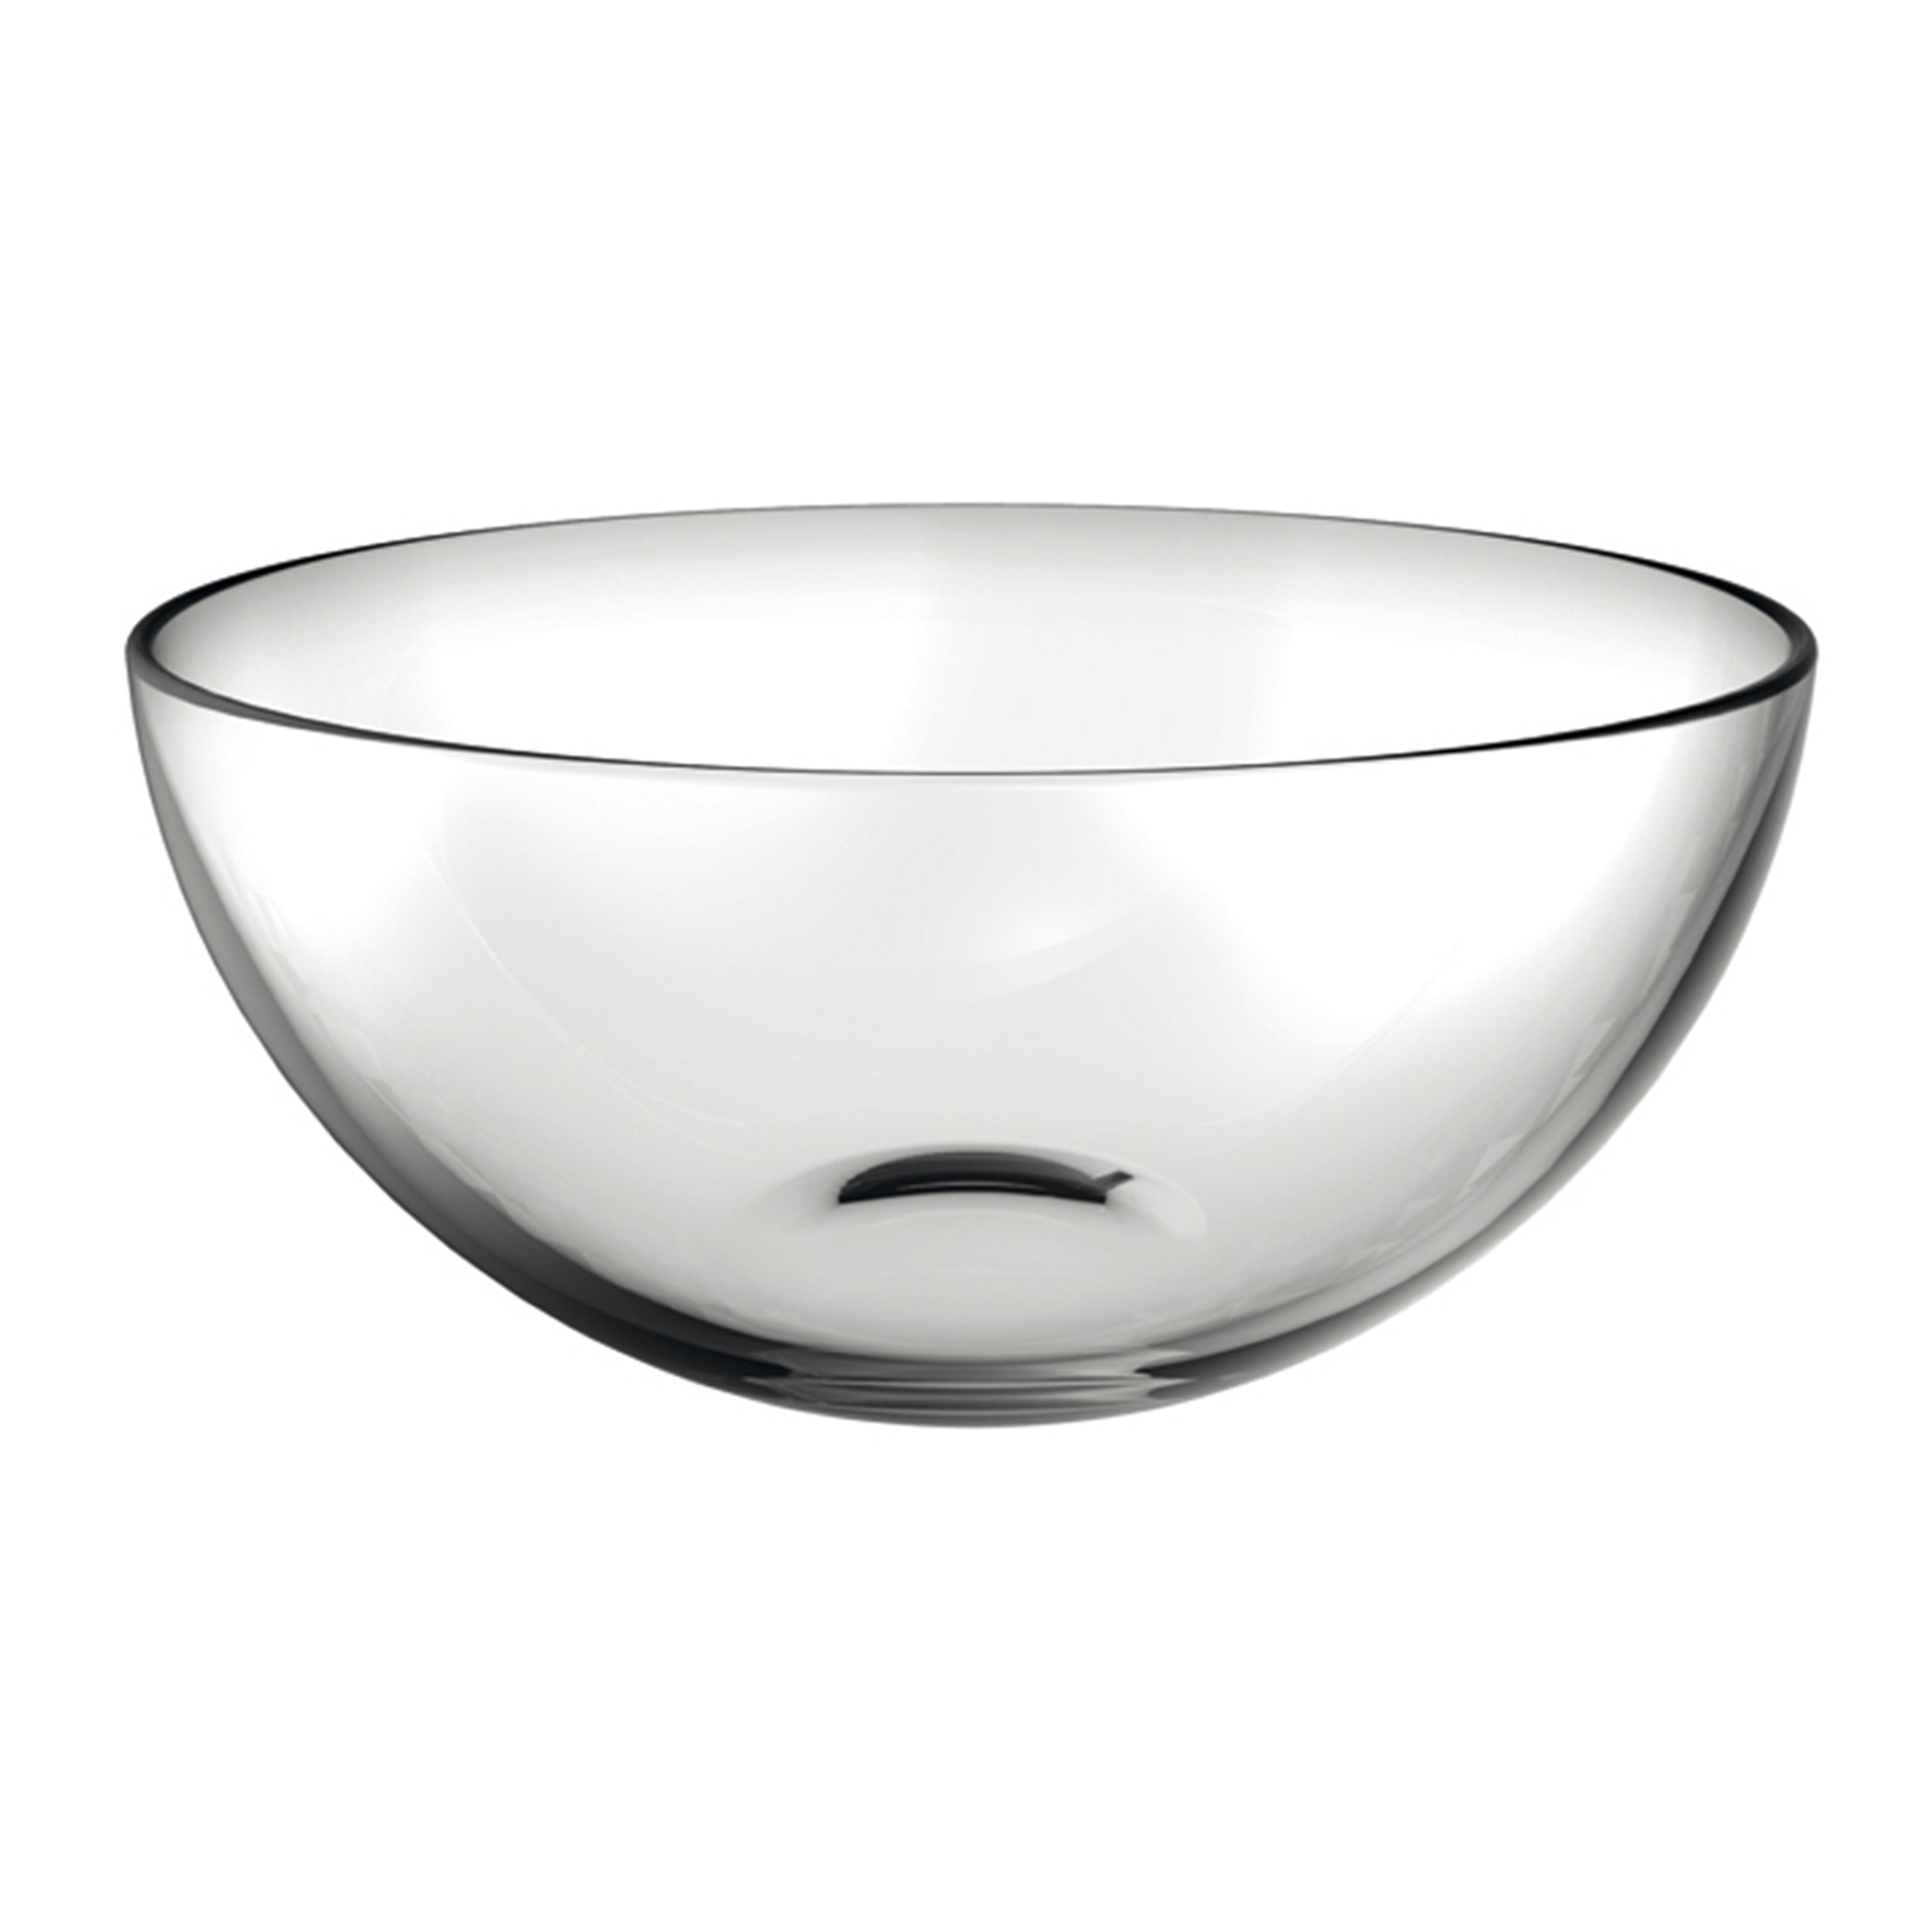 Leonardo Cucina Schale Schüssel Dekoration Glas Ø 30 cm 4.5 Ø 066329